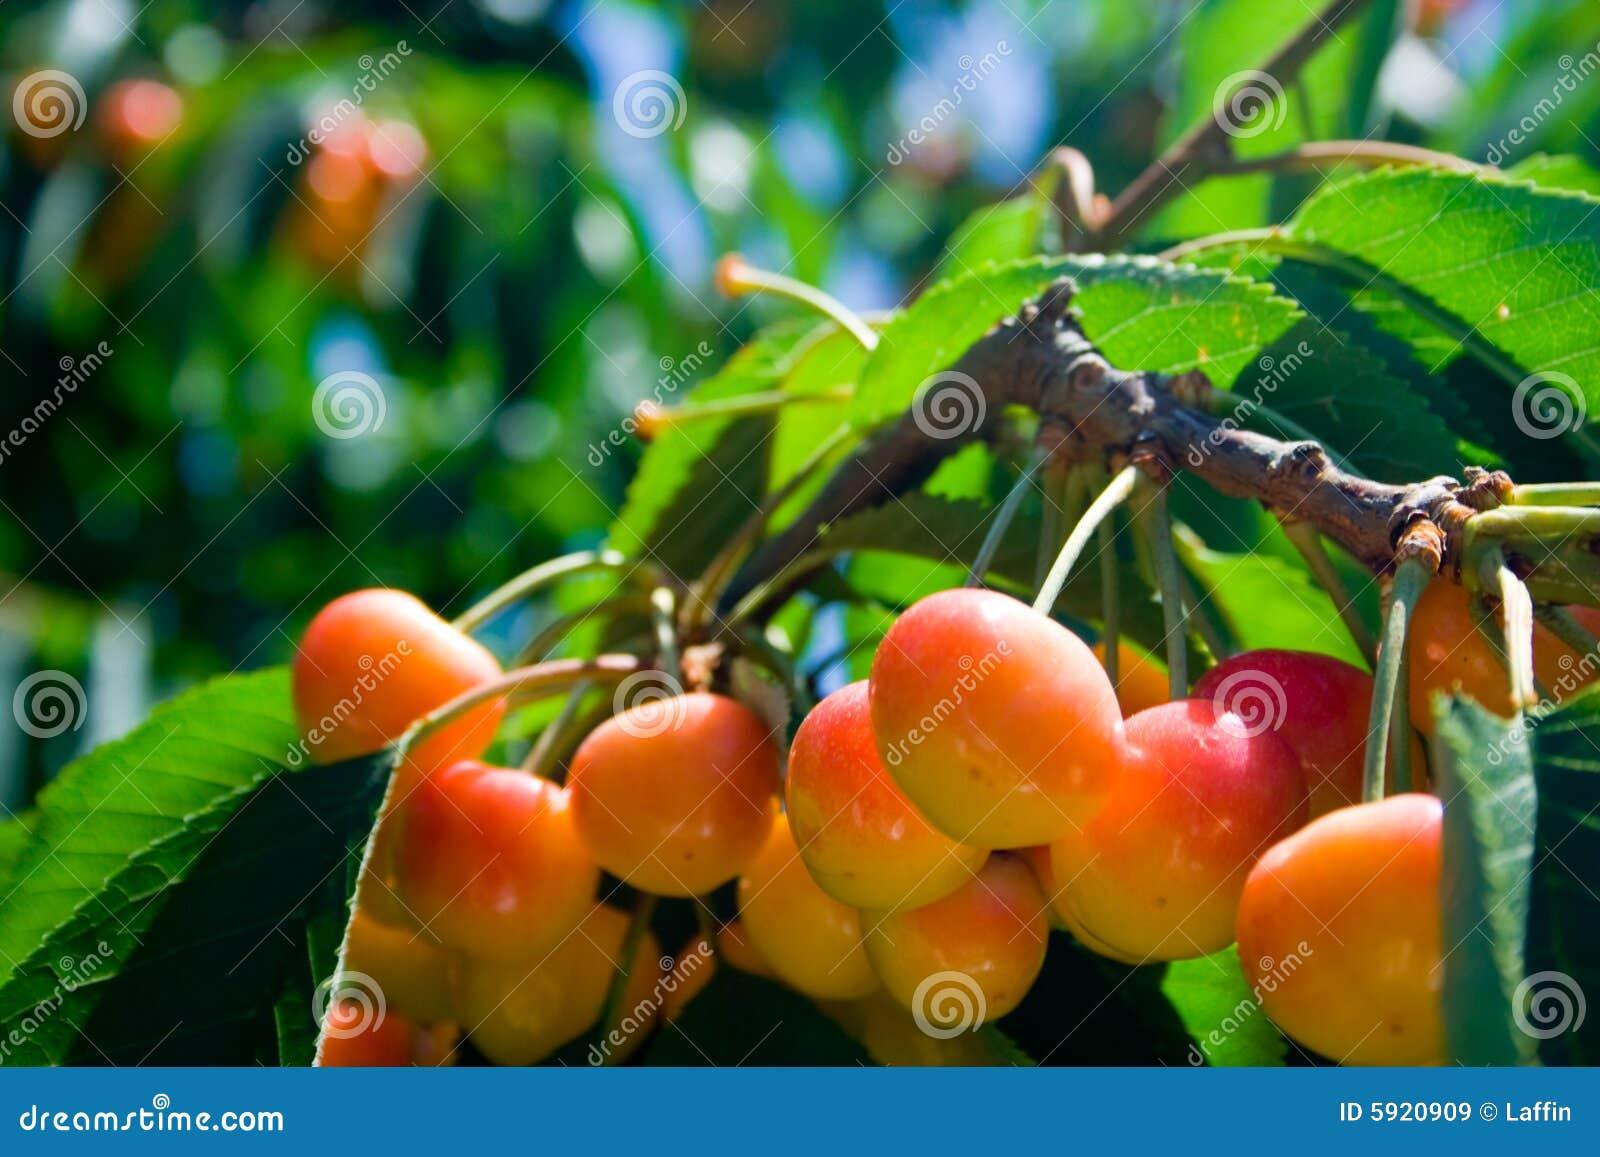 Rainier cherries on tree royalty free stock images image 5920909 - Romanian cherry tree varieties ...